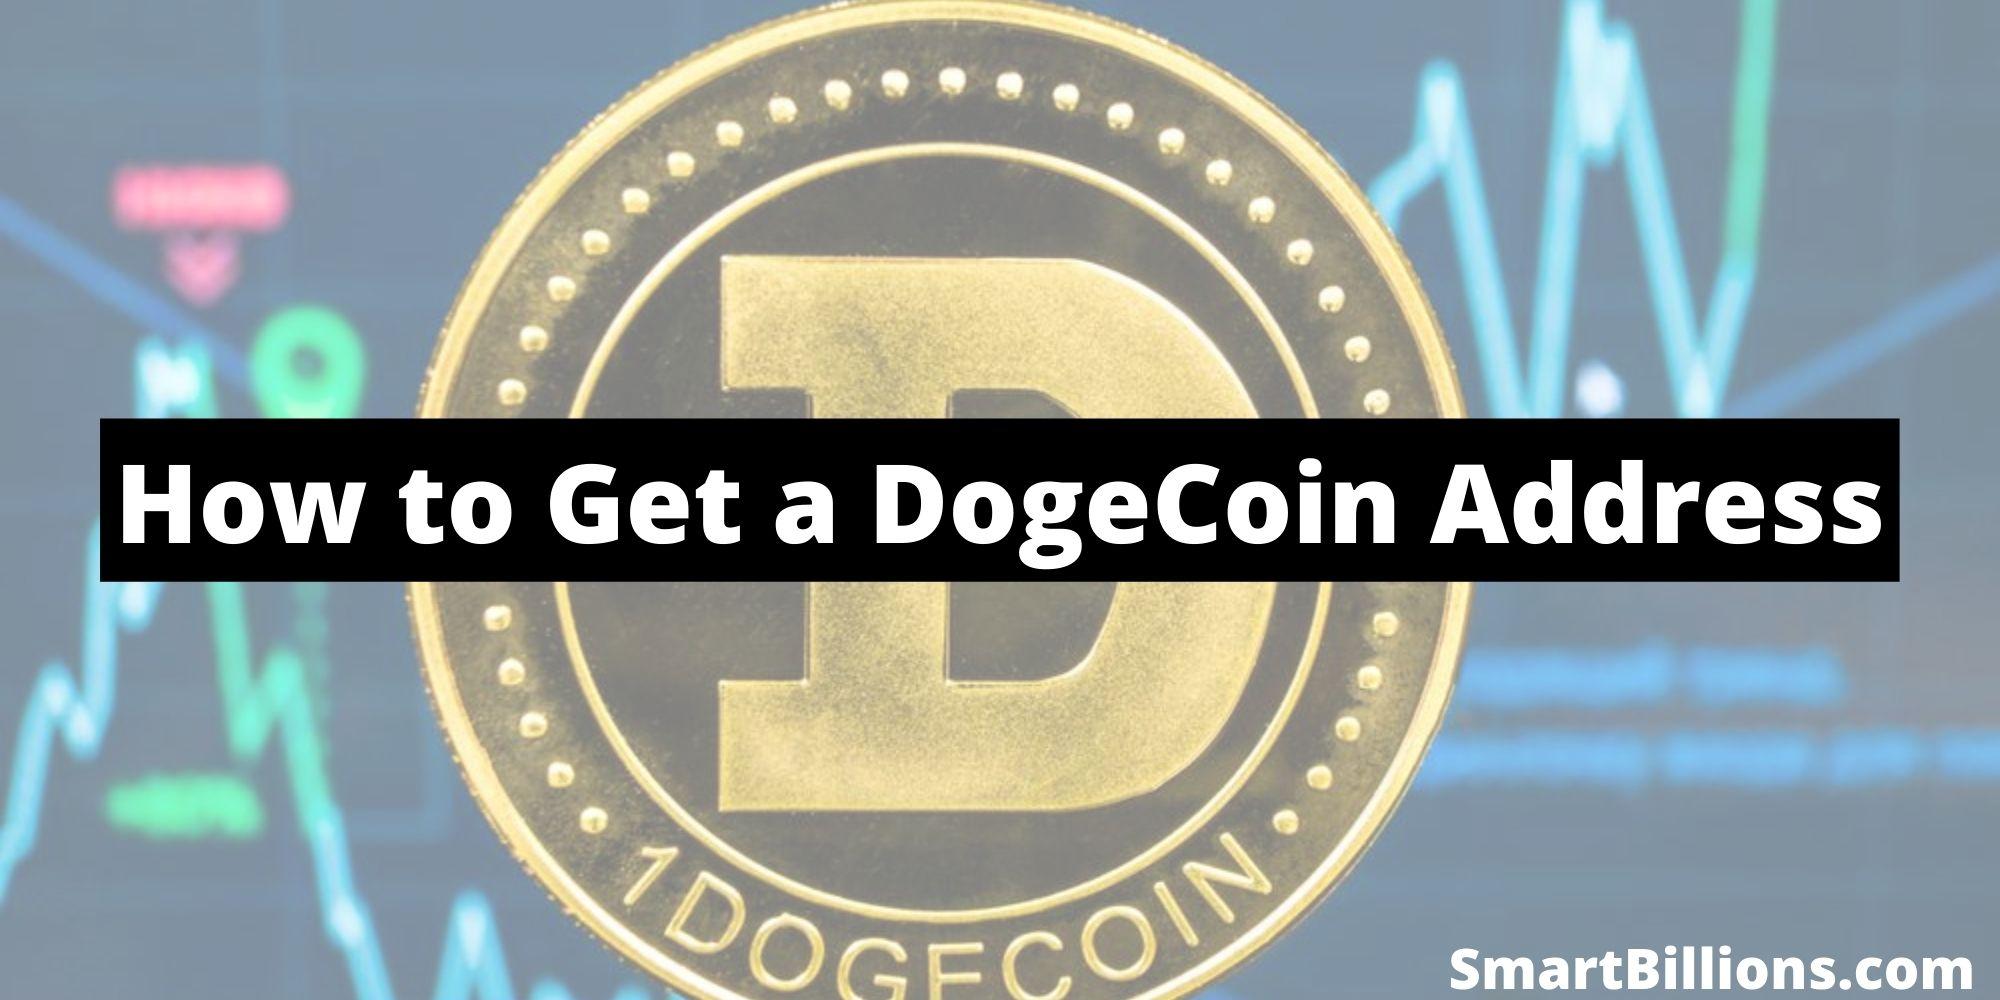 how to get a dogecoin address